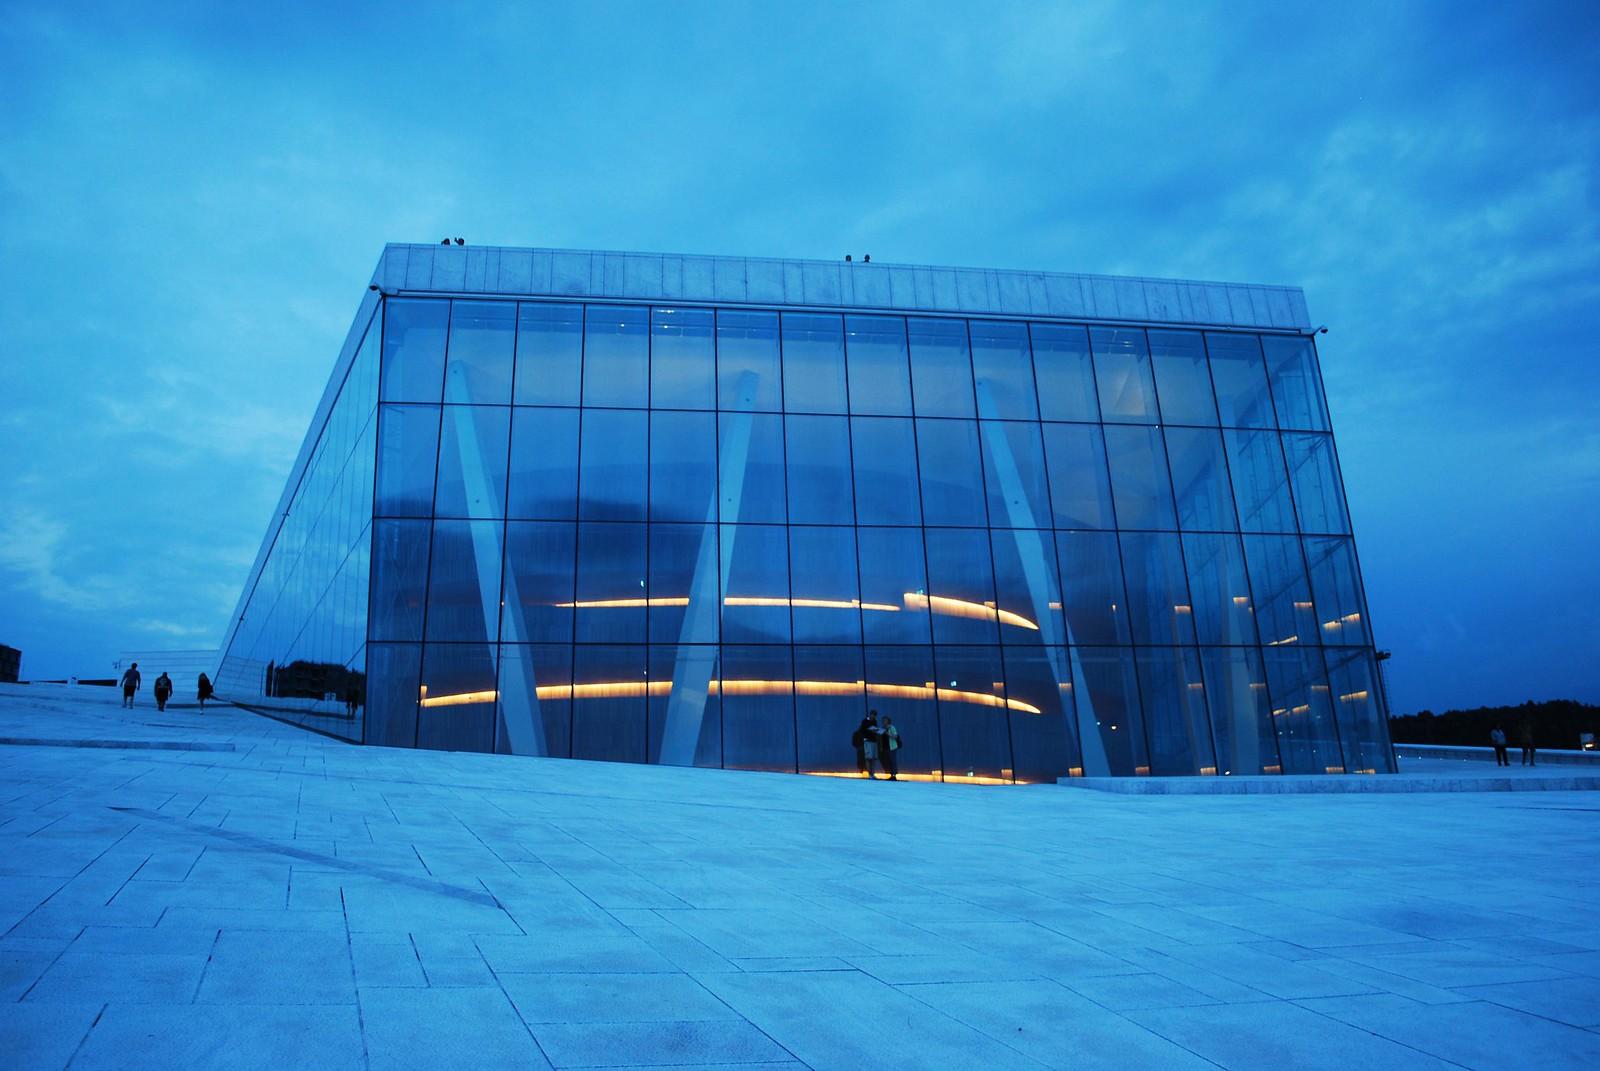 Oslo budget holiday